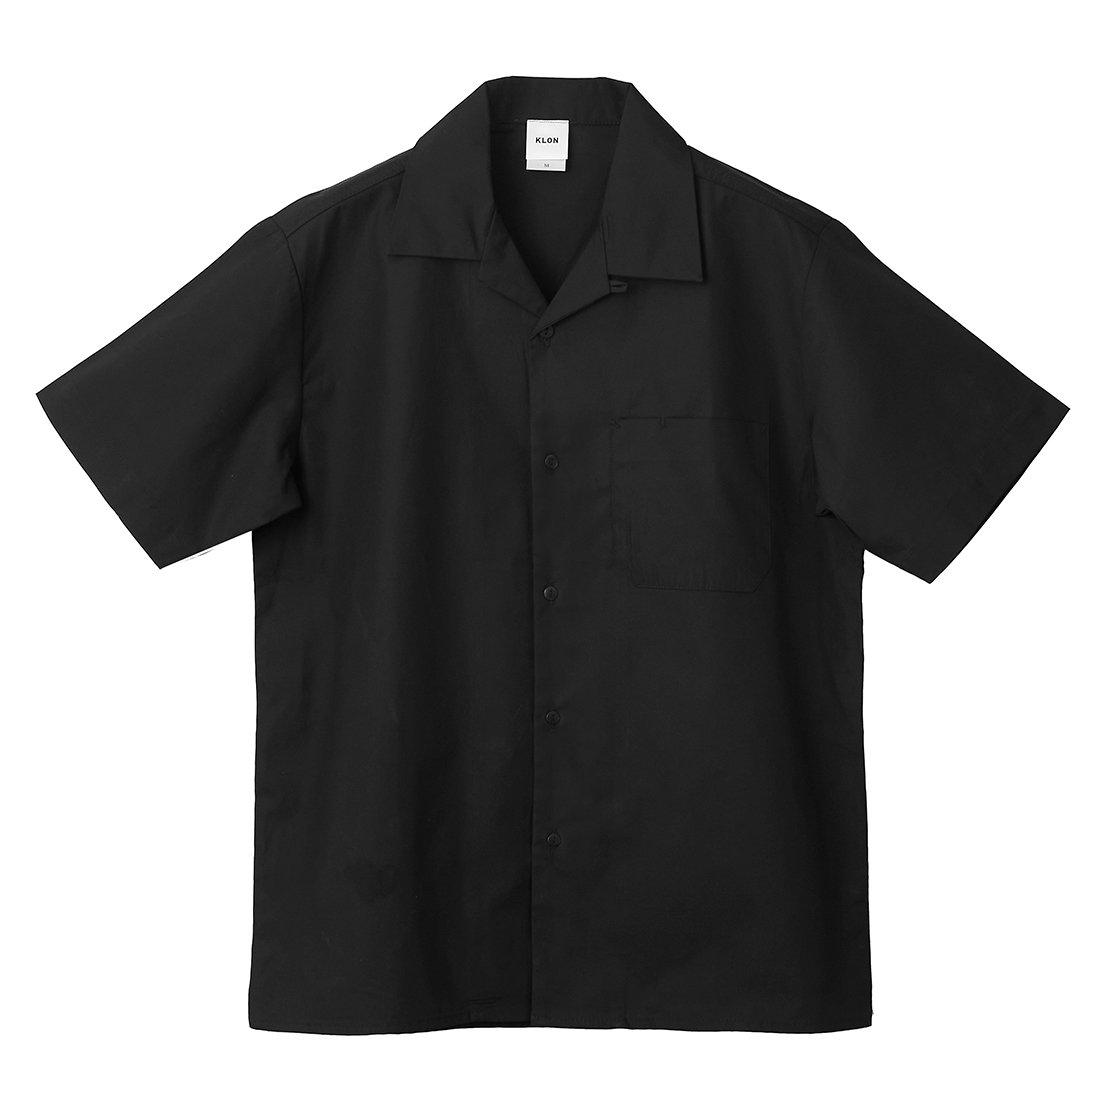 KLON WORX SHORT-SLEEVE SHIRTS BLACK